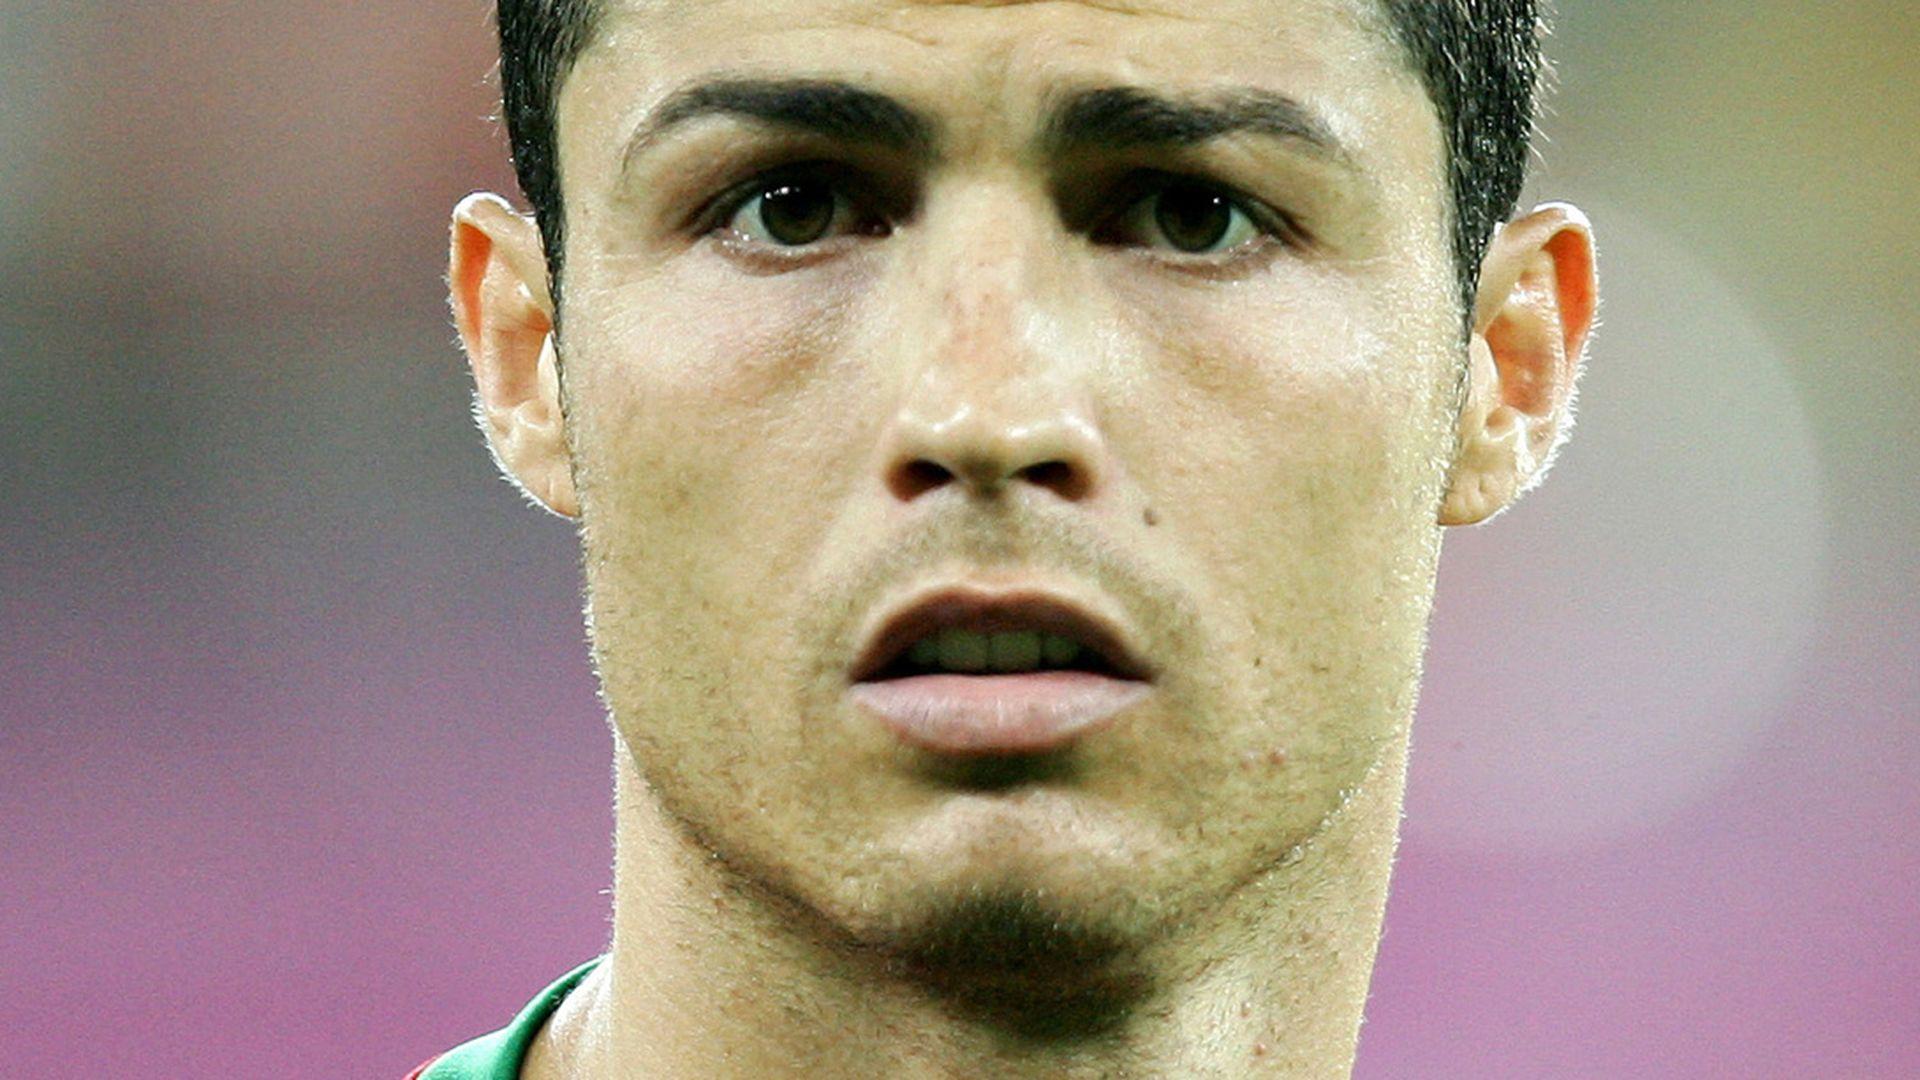 Gel Frisur Bar Refaeli disst Cristiano Ronaldo